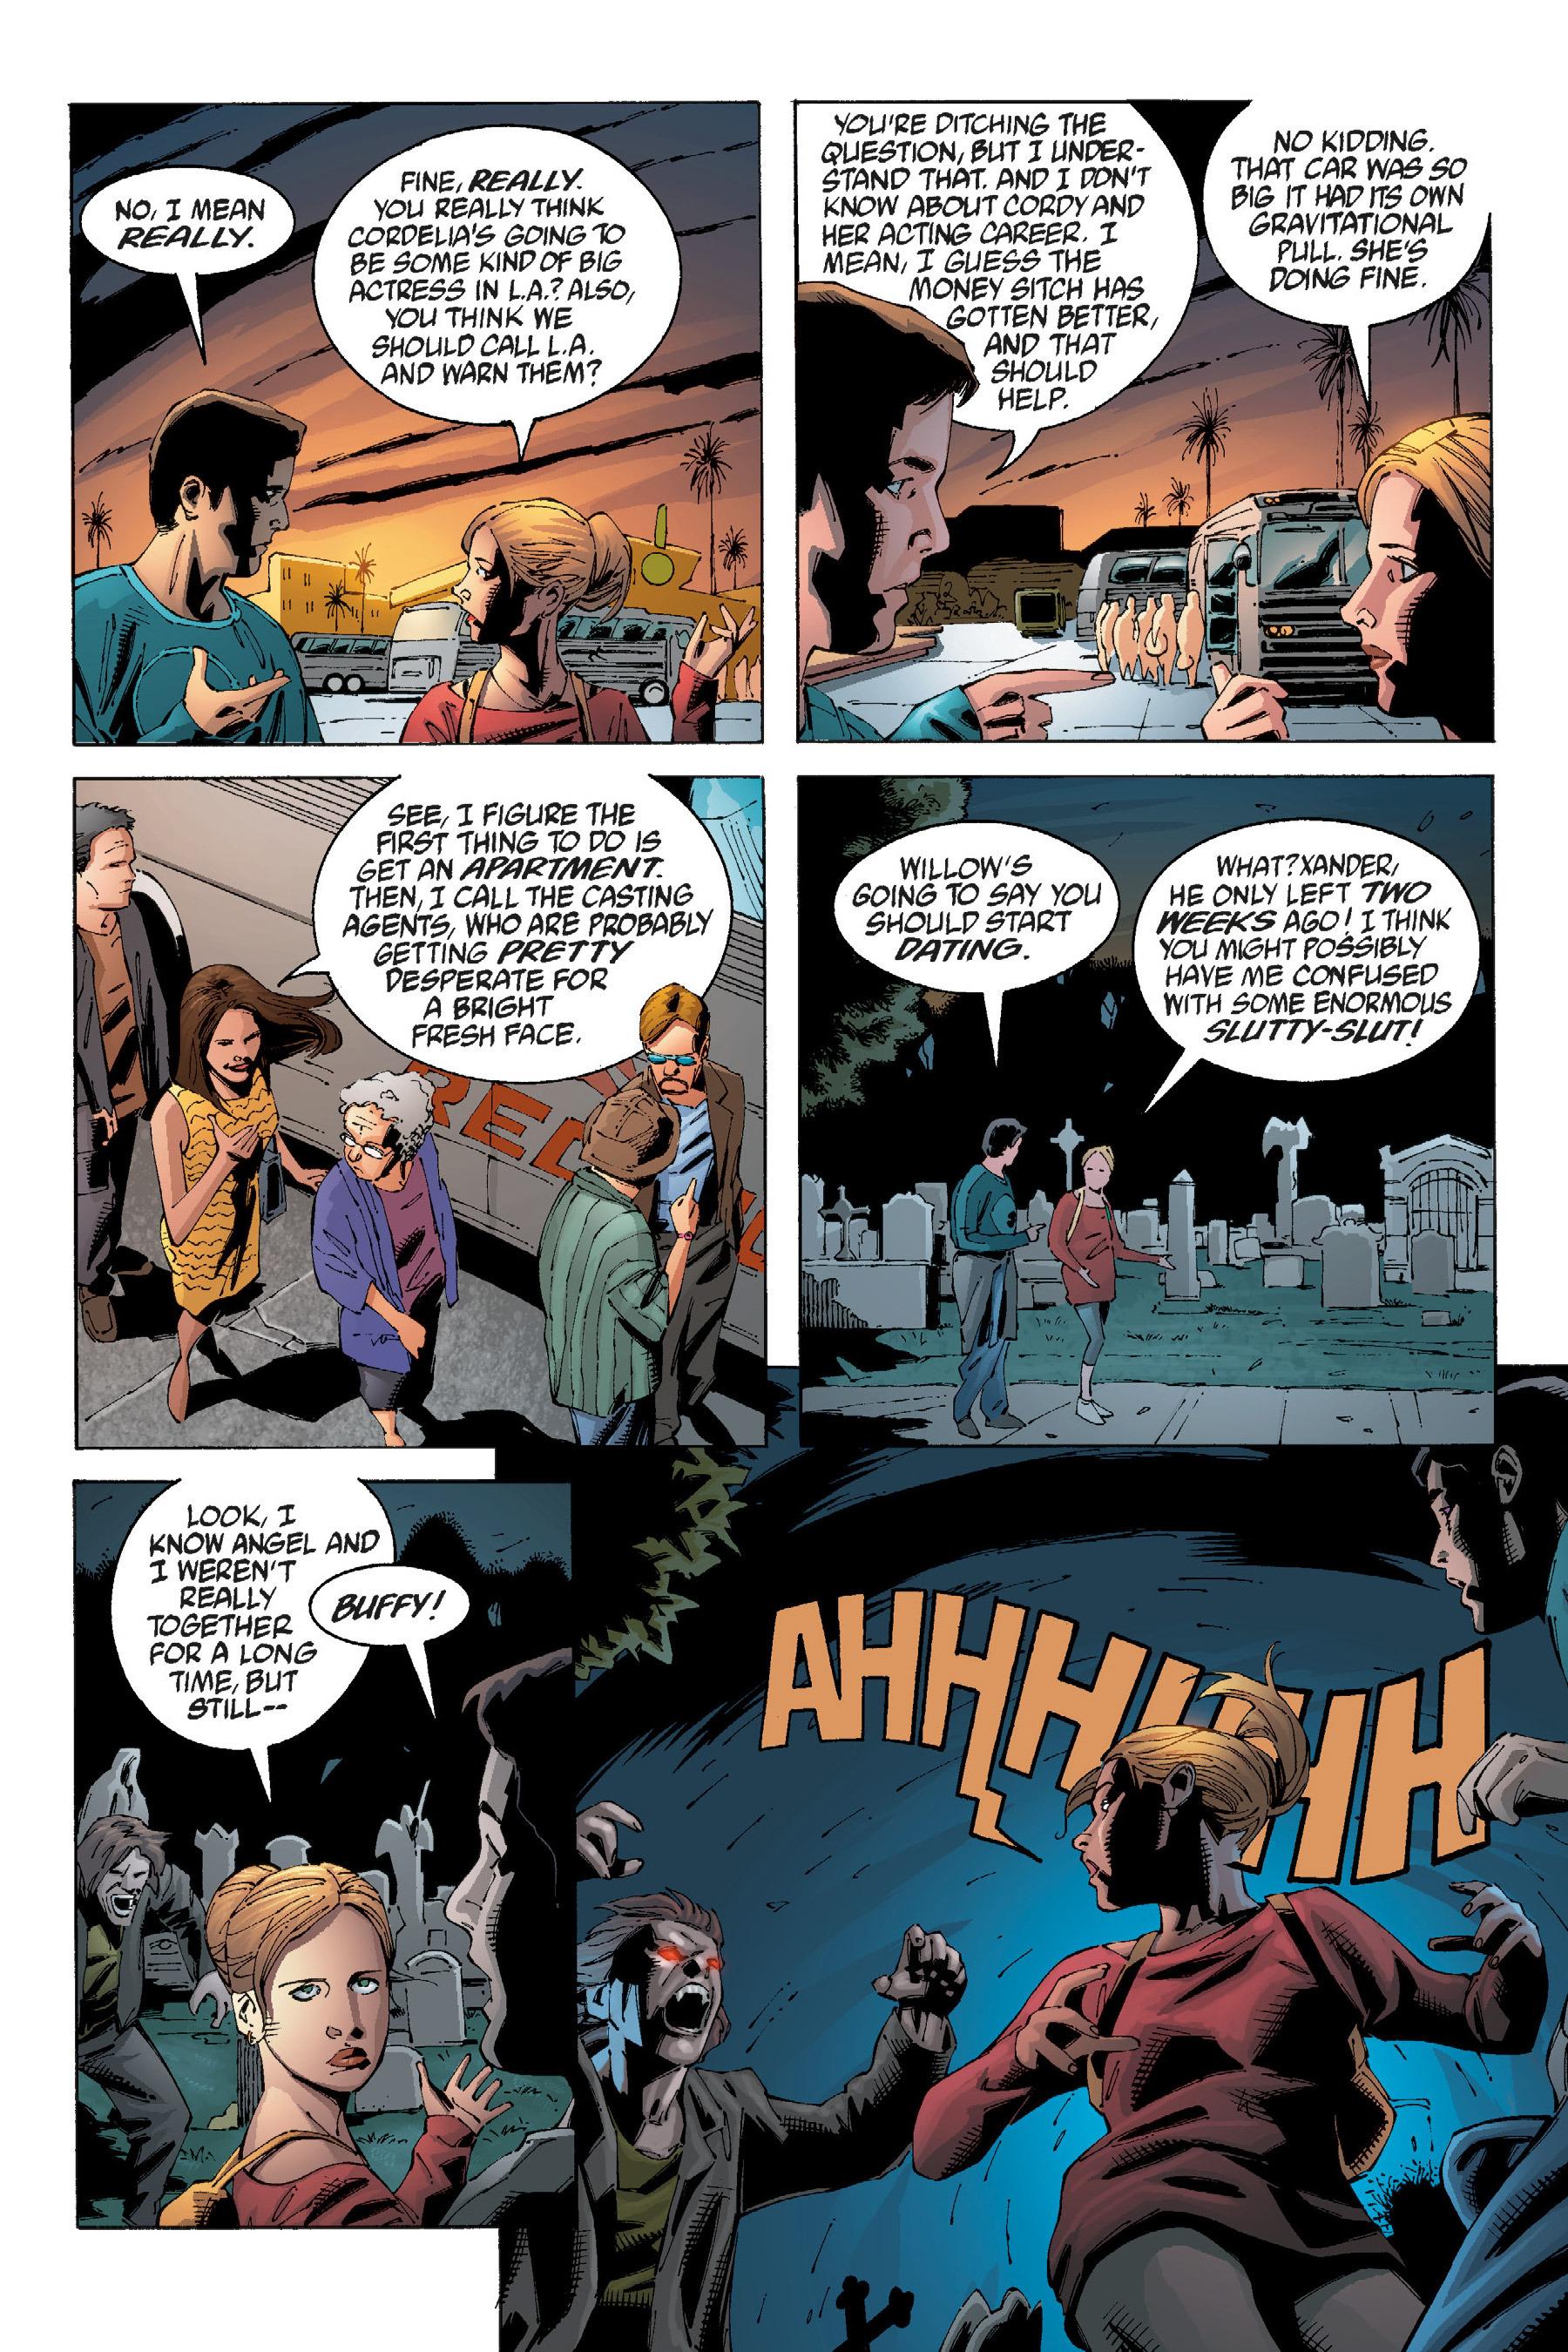 Read online Buffy the Vampire Slayer: Omnibus comic -  Issue # TPB 5 - 20